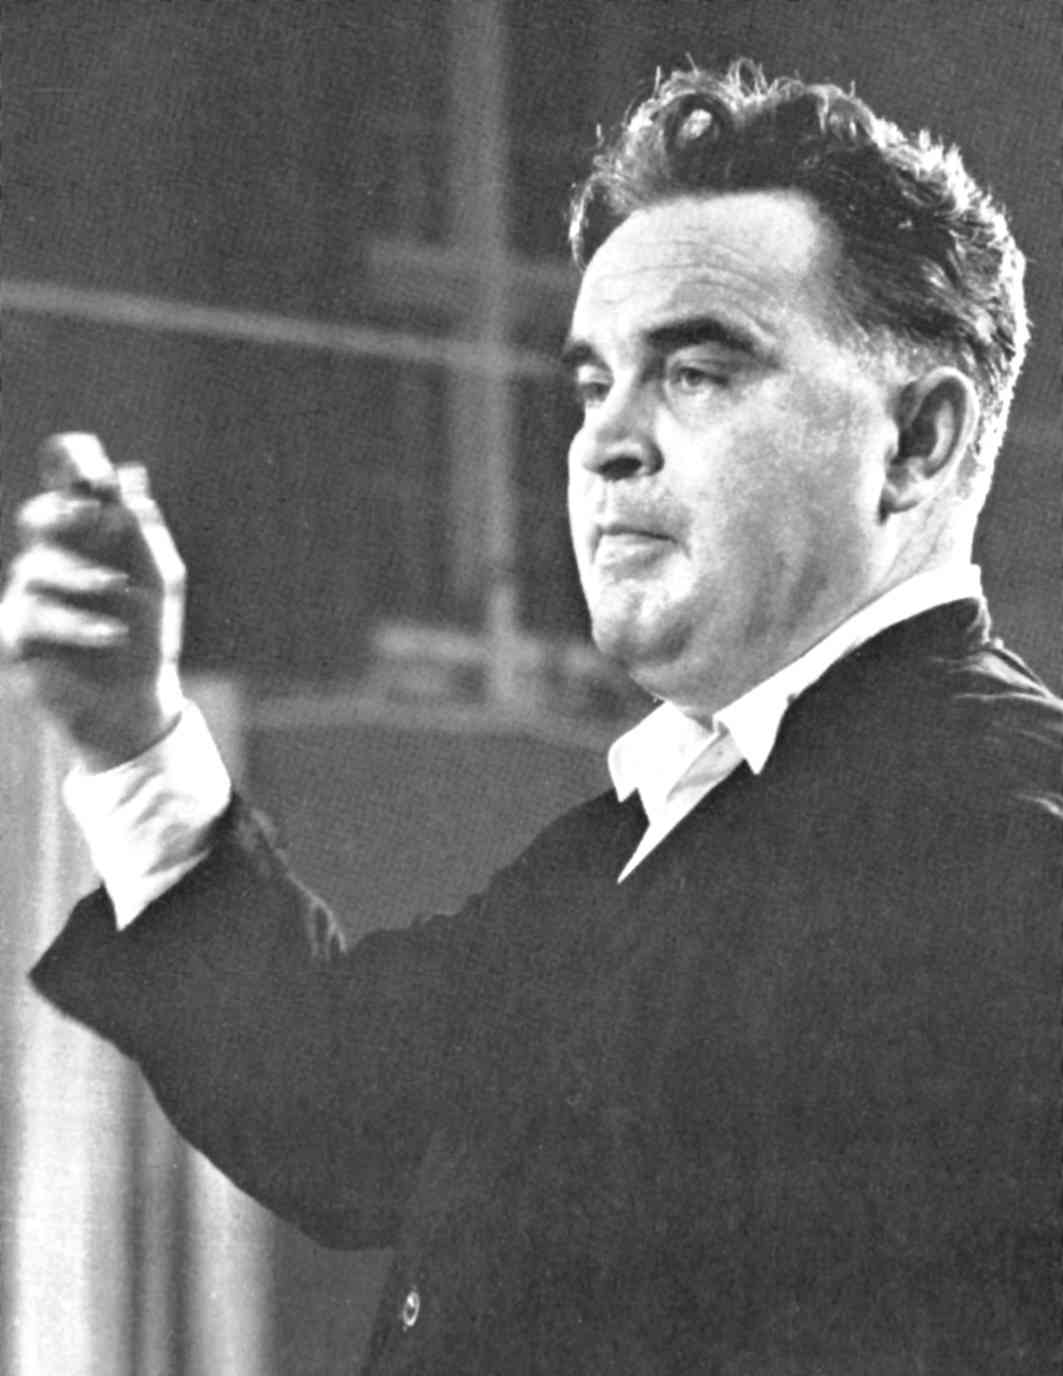 Wilhelm Schüchter en 1958. Copyright Dortmunder Theatersammlung, tous droits réservés